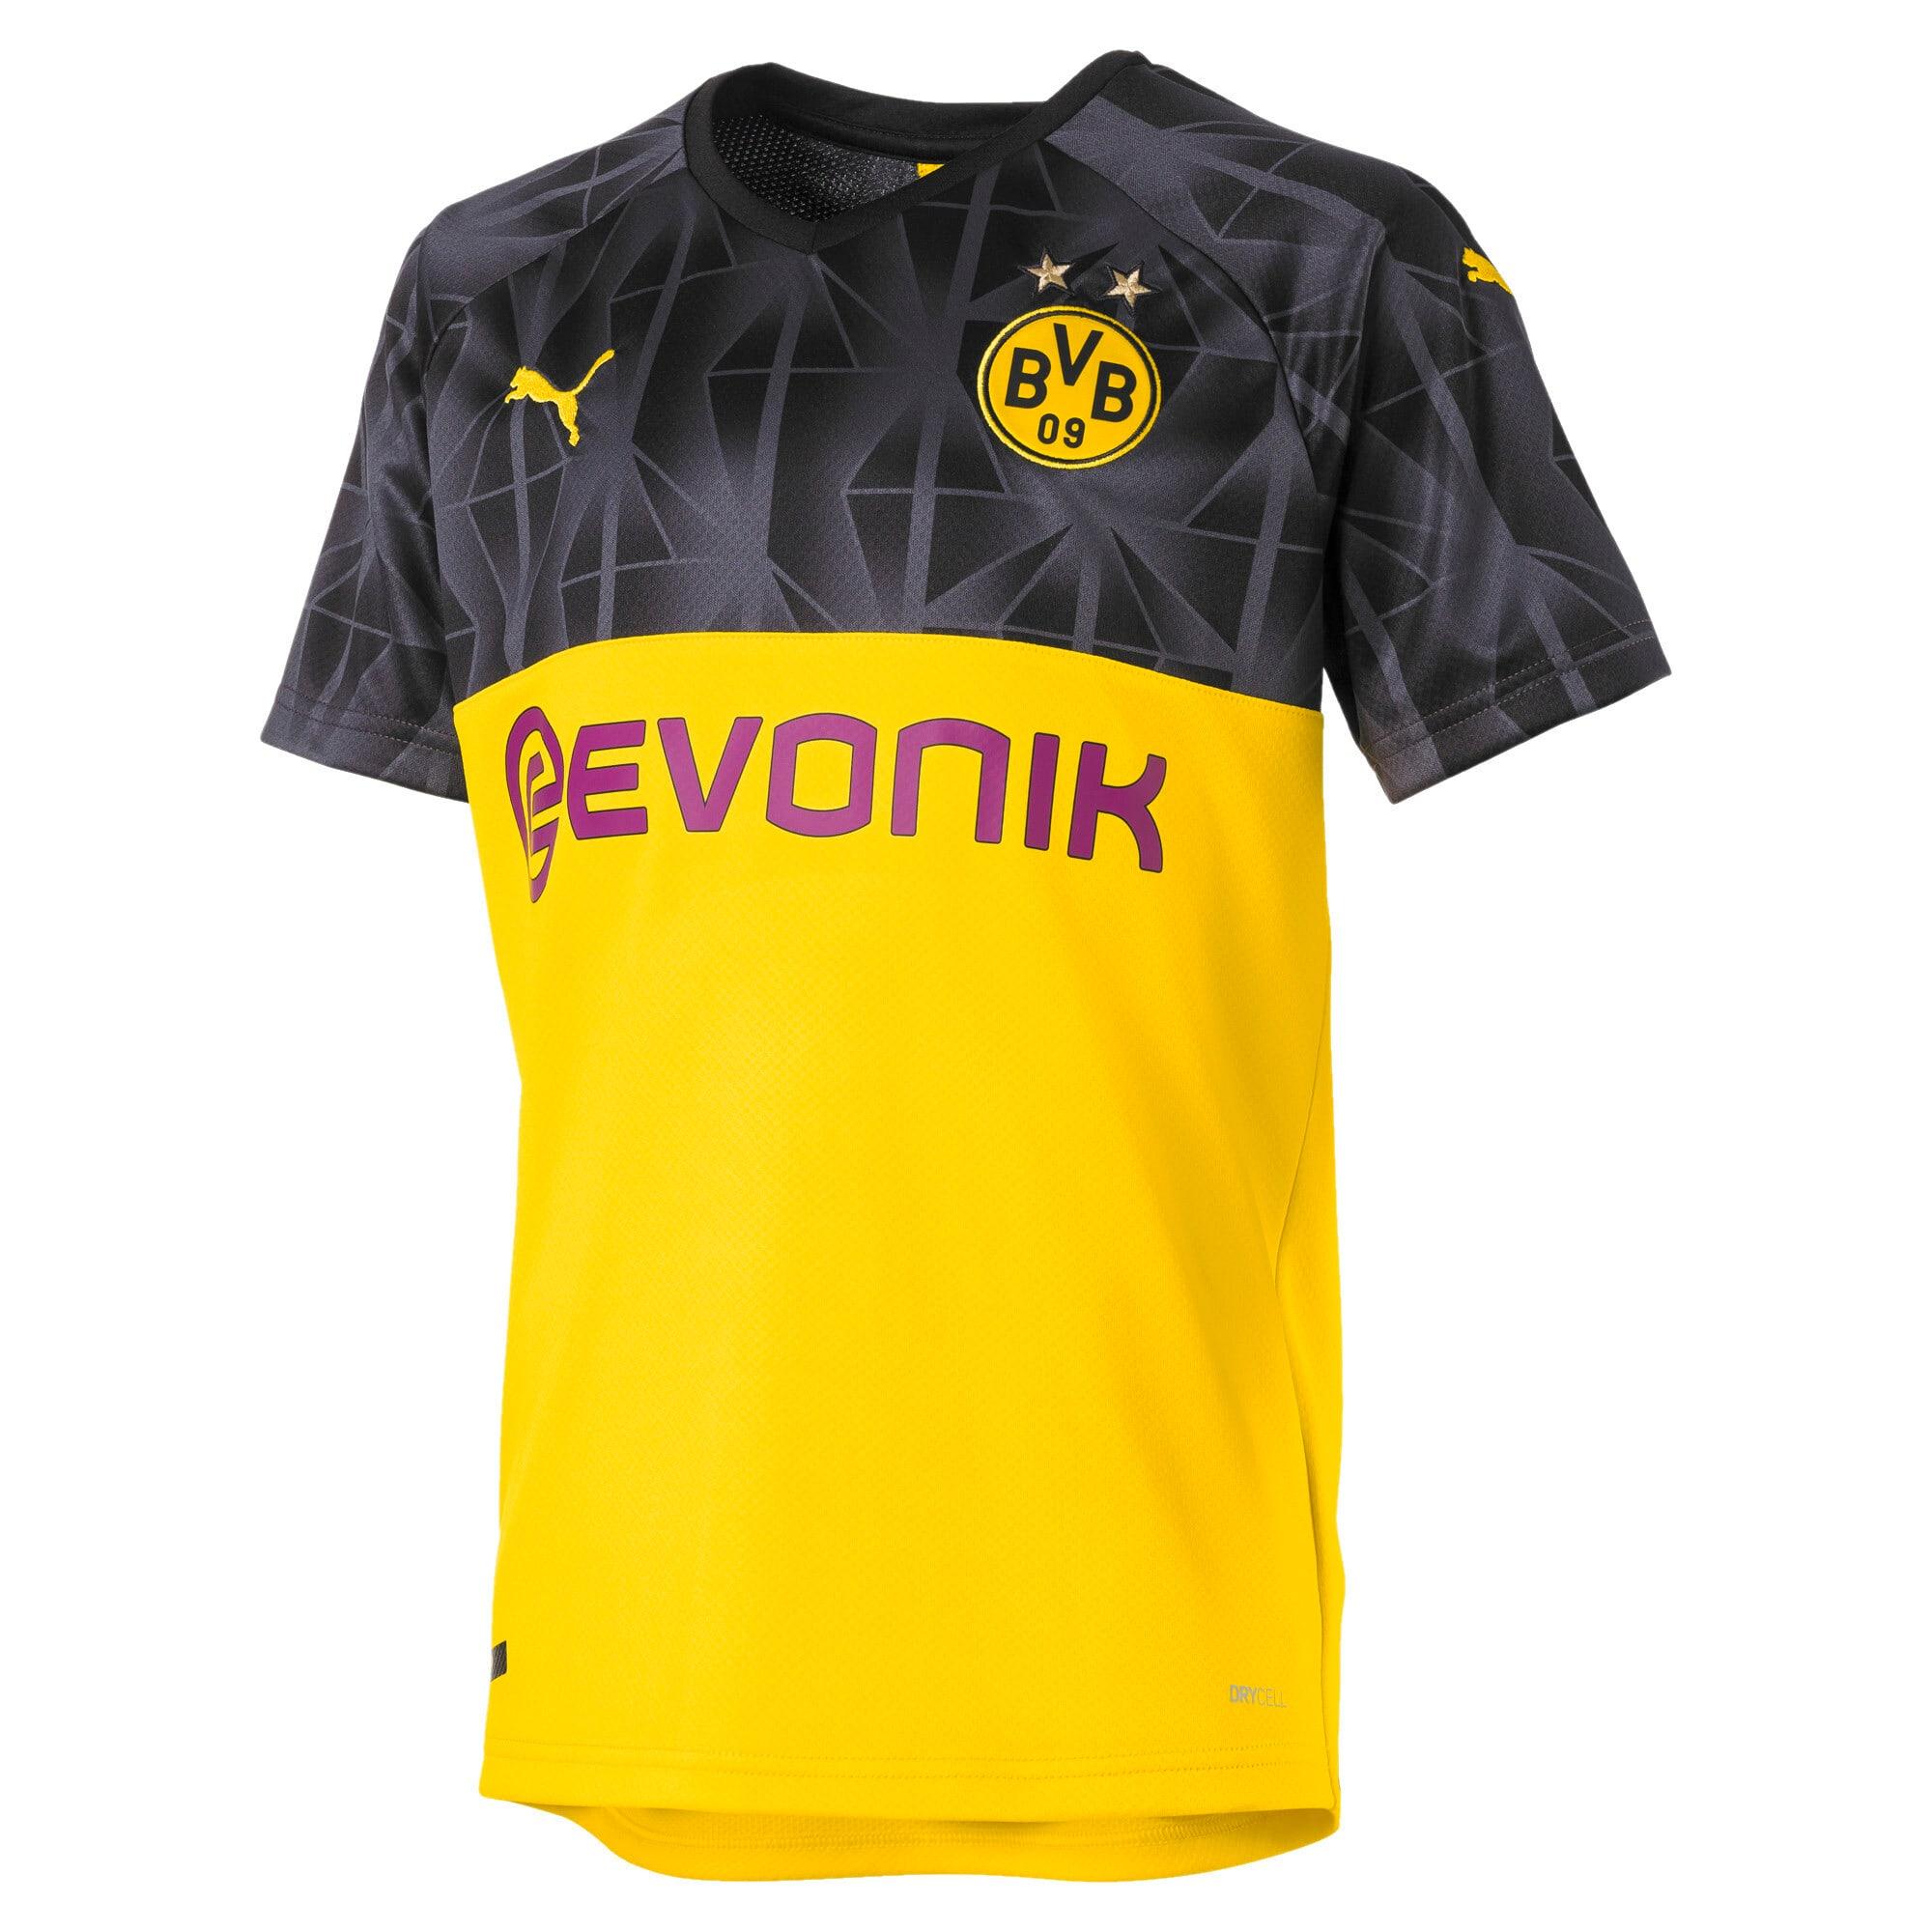 Thumbnail 1 of BVB Cup Boys' Replica Jersey, Cyber Yellow-Puma Black, medium